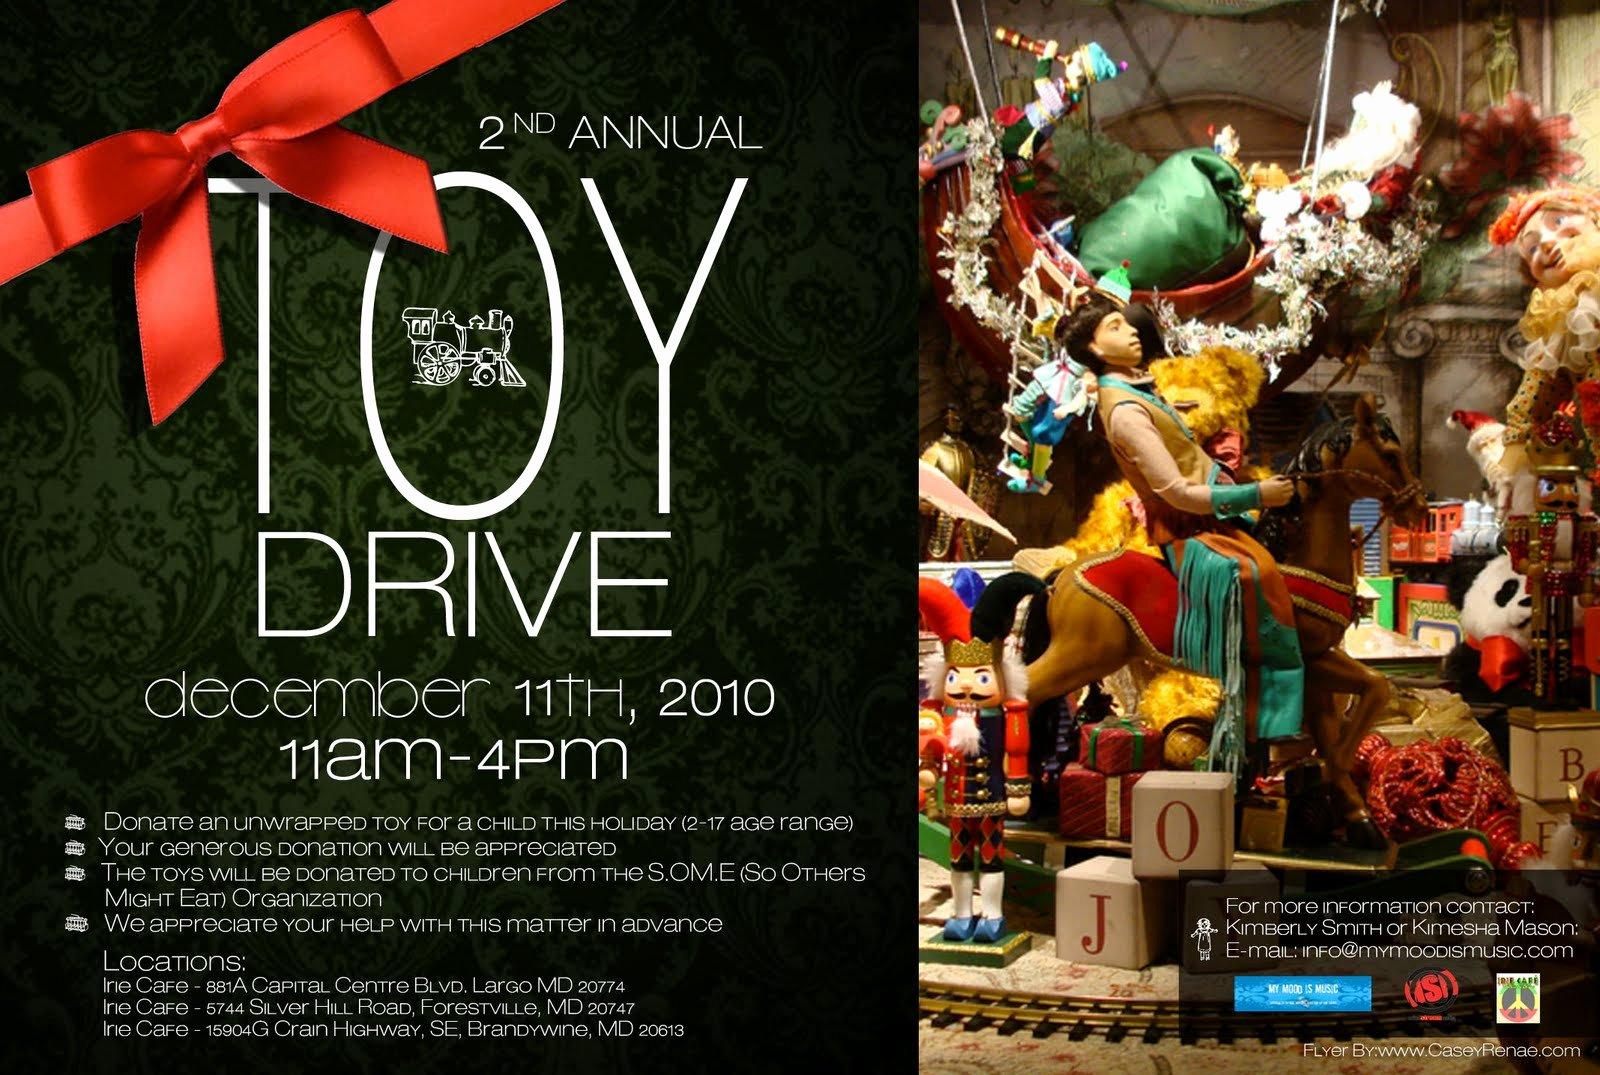 Toy Drive Flyer Template Luxury Designers Plex toy Drive Flyer